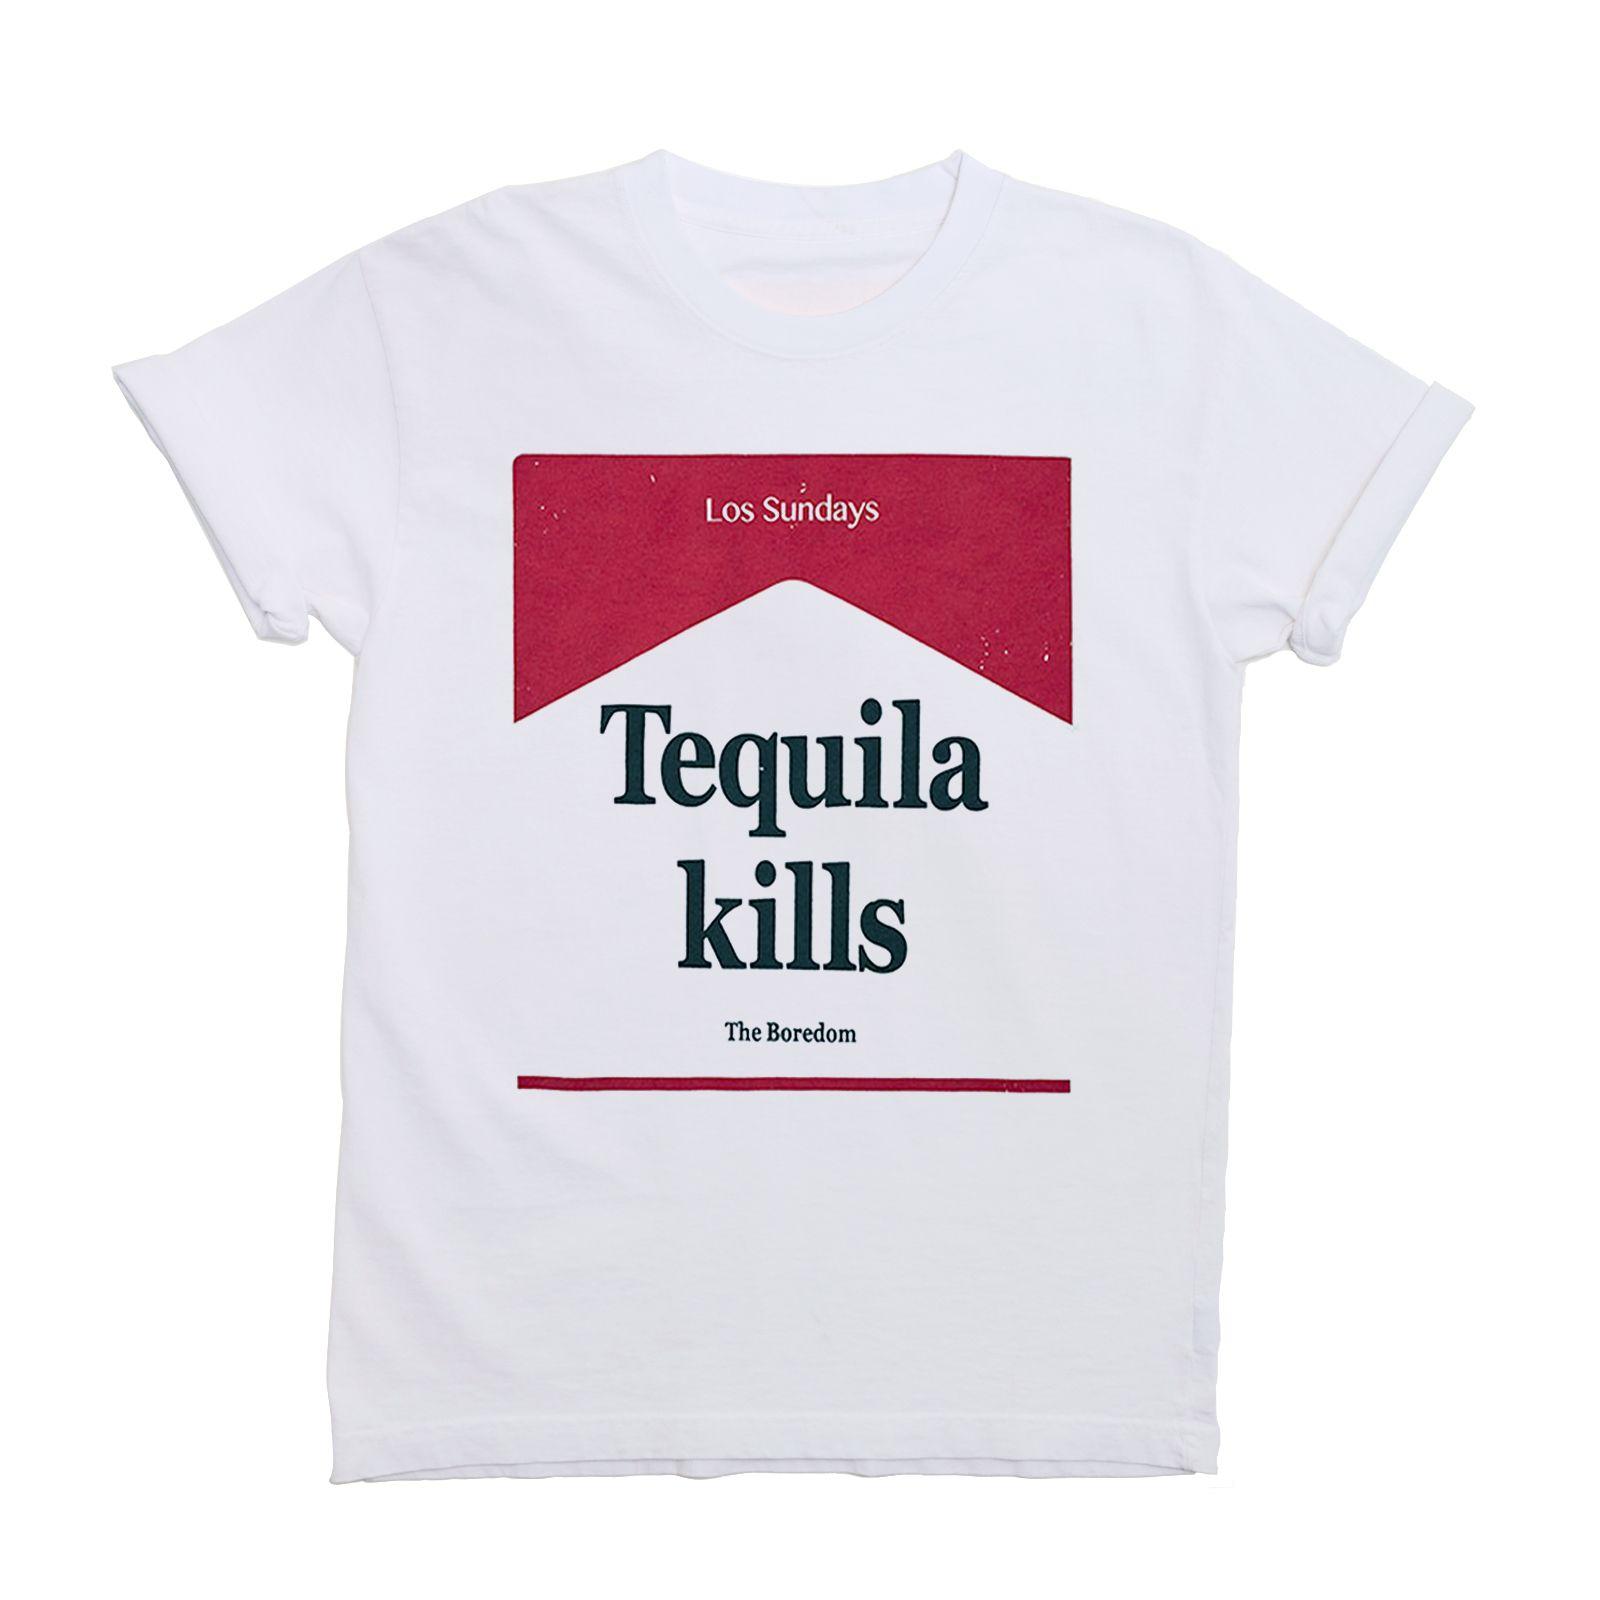 95cc36c1fa3b TEQUILA KILLS TEE | 2018 S/S | Shirts, T shirt, Tee shirts